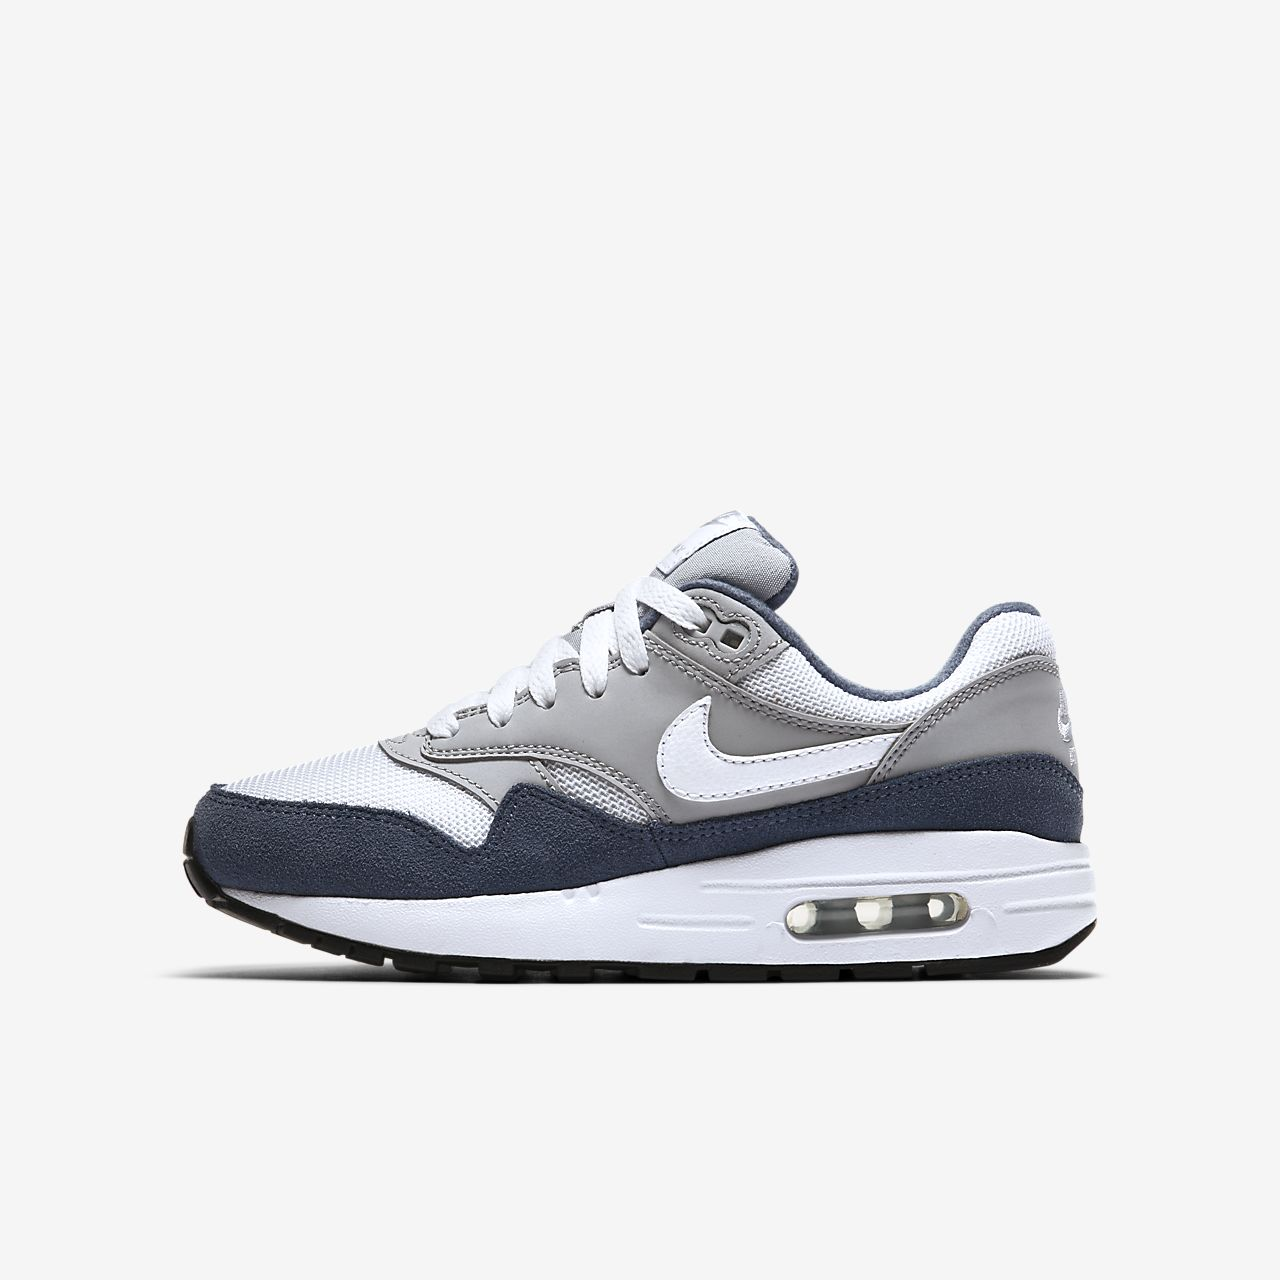 new style 42601 8722a Nike Air Max 1 Older Kids  Shoe. Nike.com GB